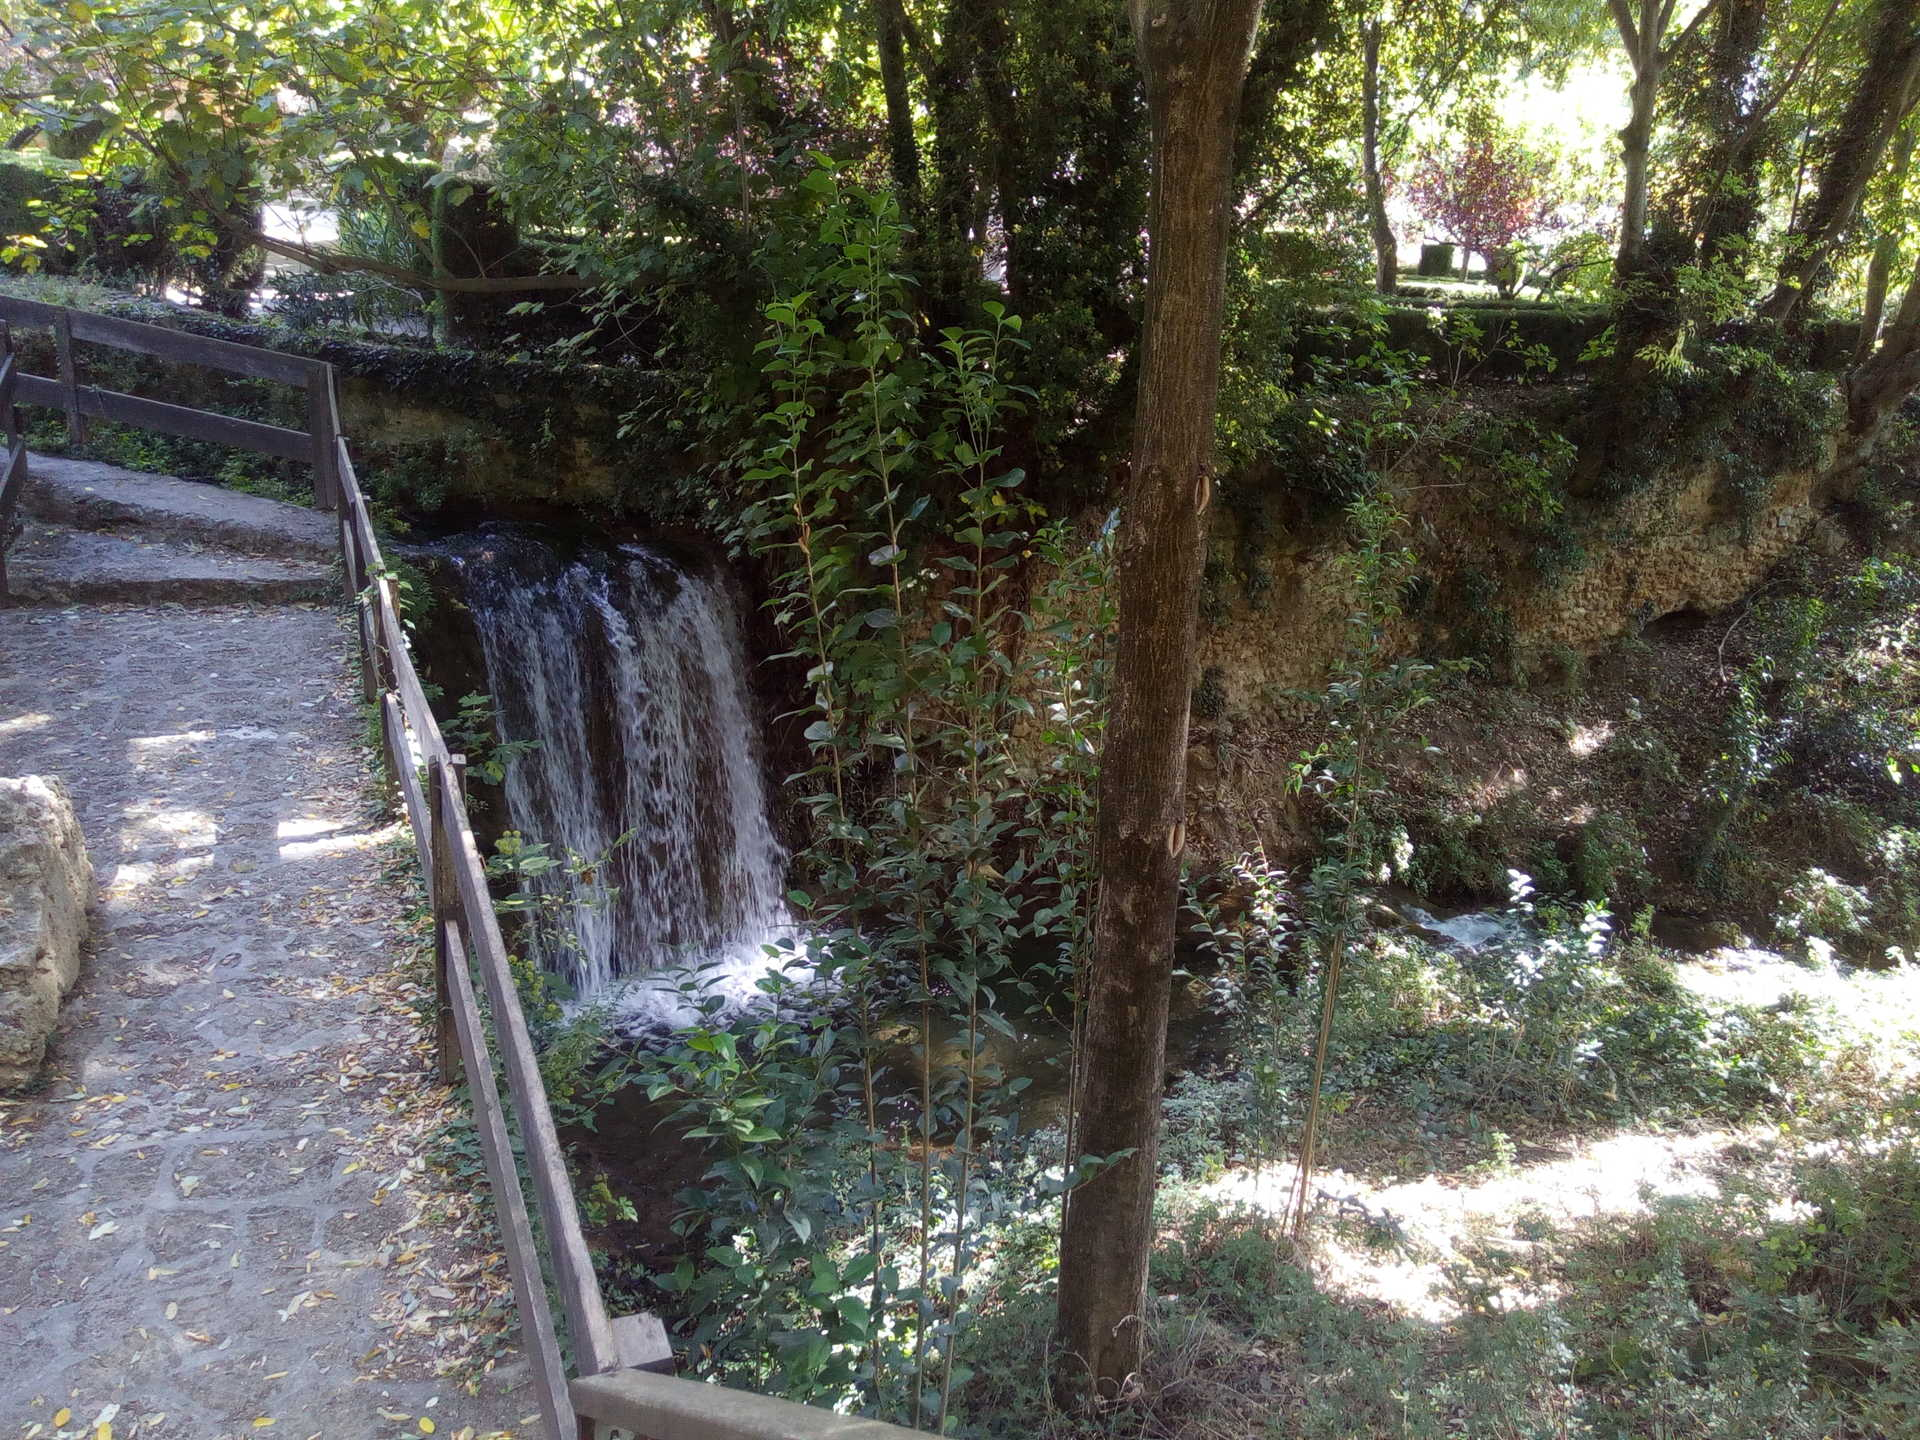 Parque La Floresta